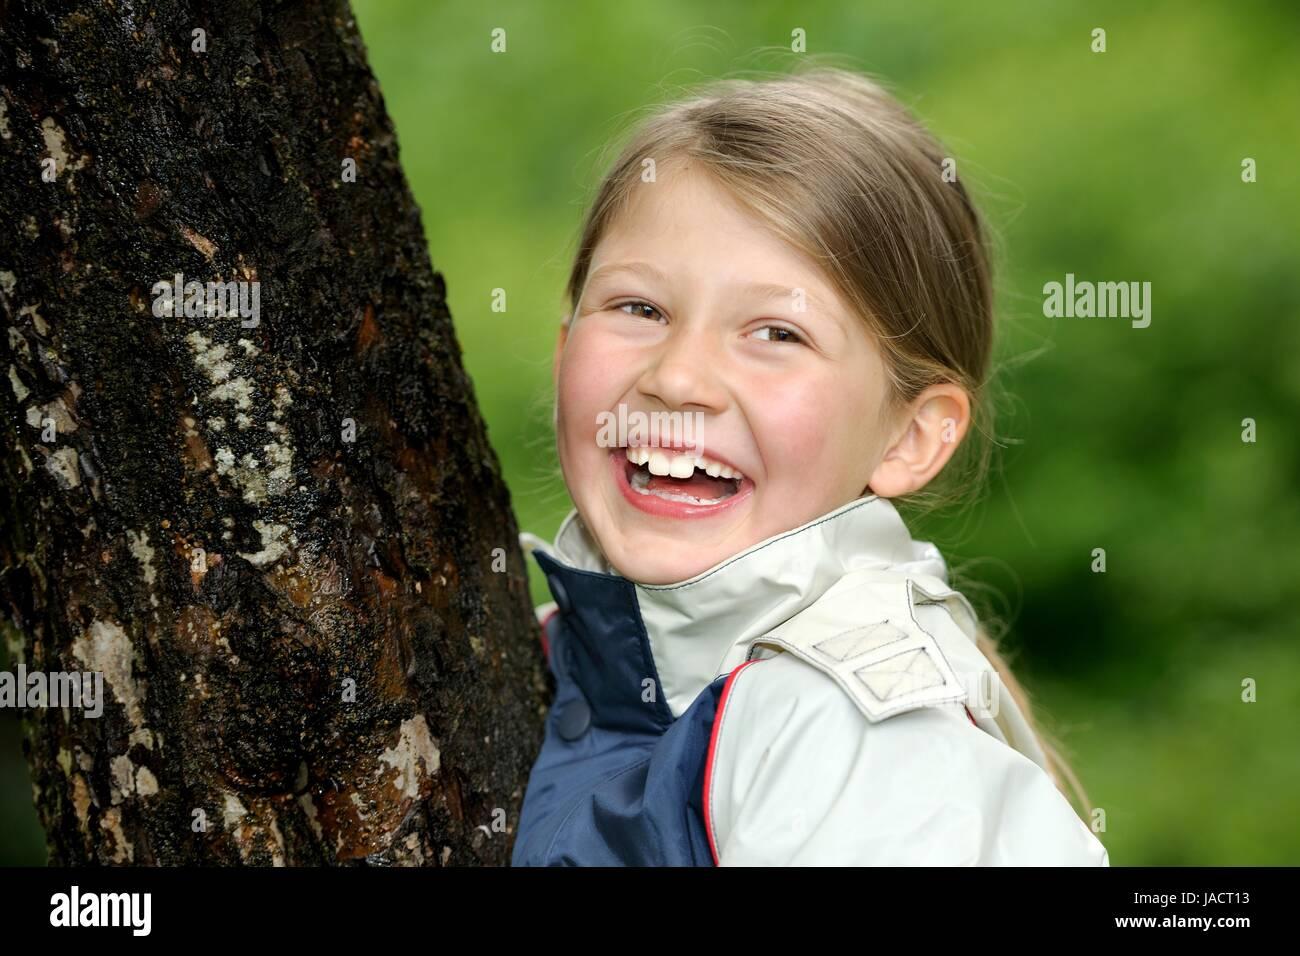 Mädchen, Baum, Umarmen, Beschützen, Bewahren, Schutz, genre, Schützen, Umweltschutz, Ökologie, Photo Stock